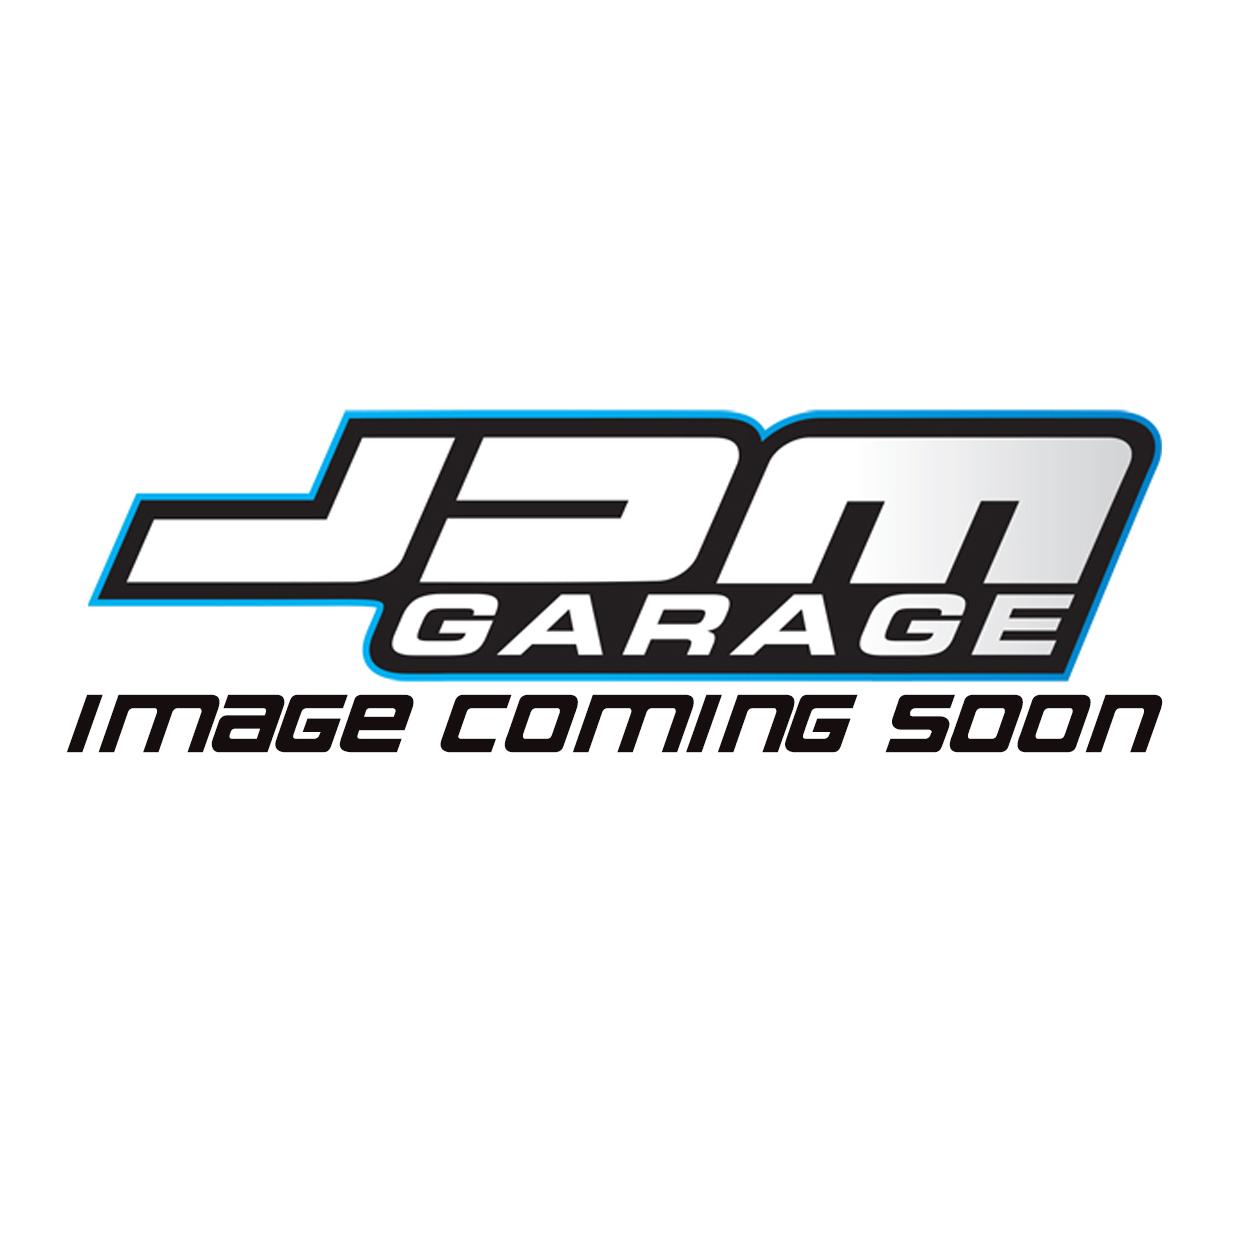 OE Replacement RB25DET Basic Engine Gasket Set Fits Nissan Skyline R33 GTST / R34 GTT / Stagea WC34 / Laurel C34 C35